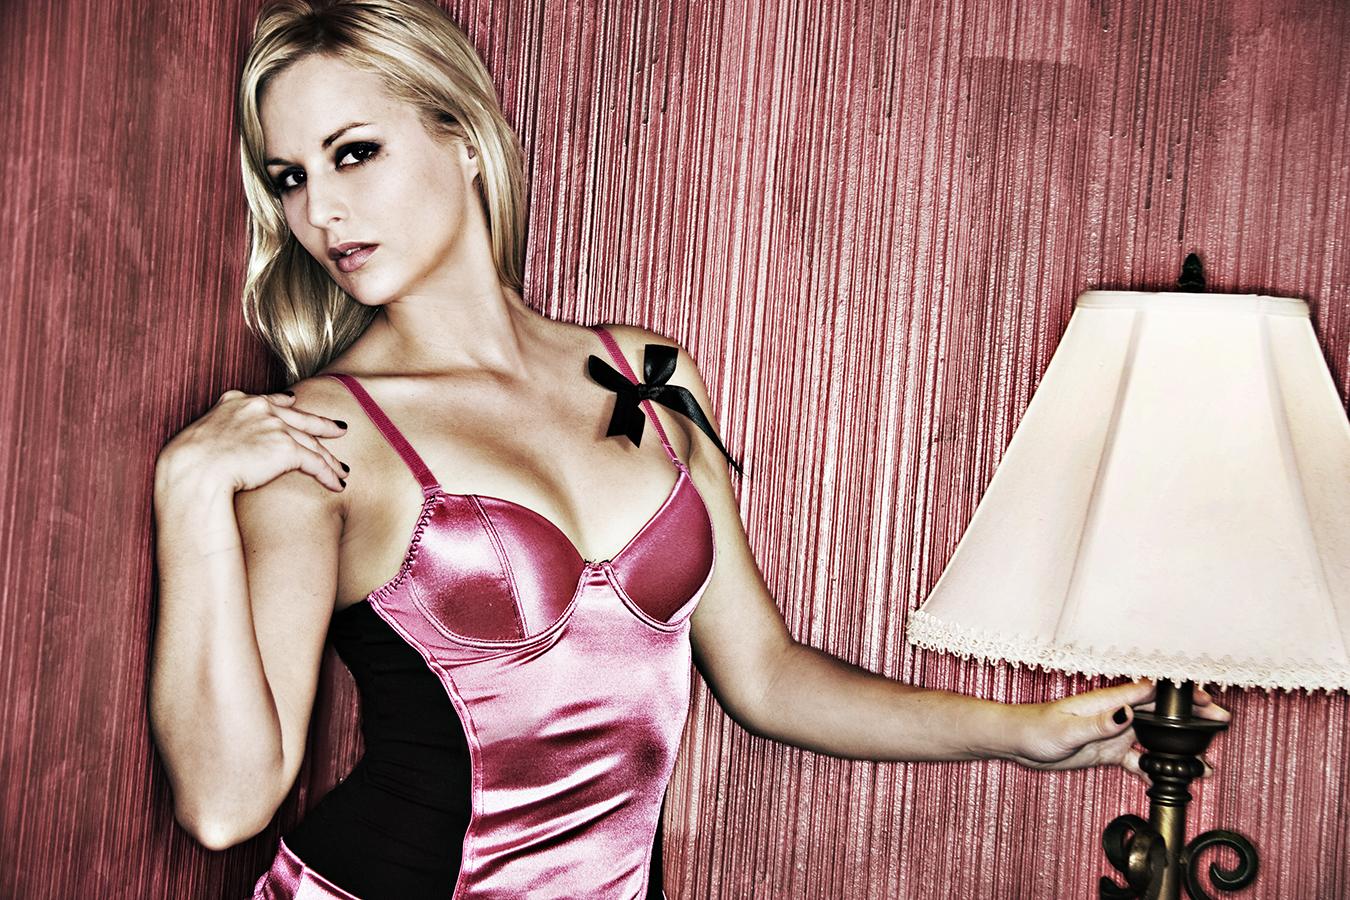 Tony_Ward_erotica_portrait_diary_Alison_Jersey_Girl_Victoria's_Secret_boudoir